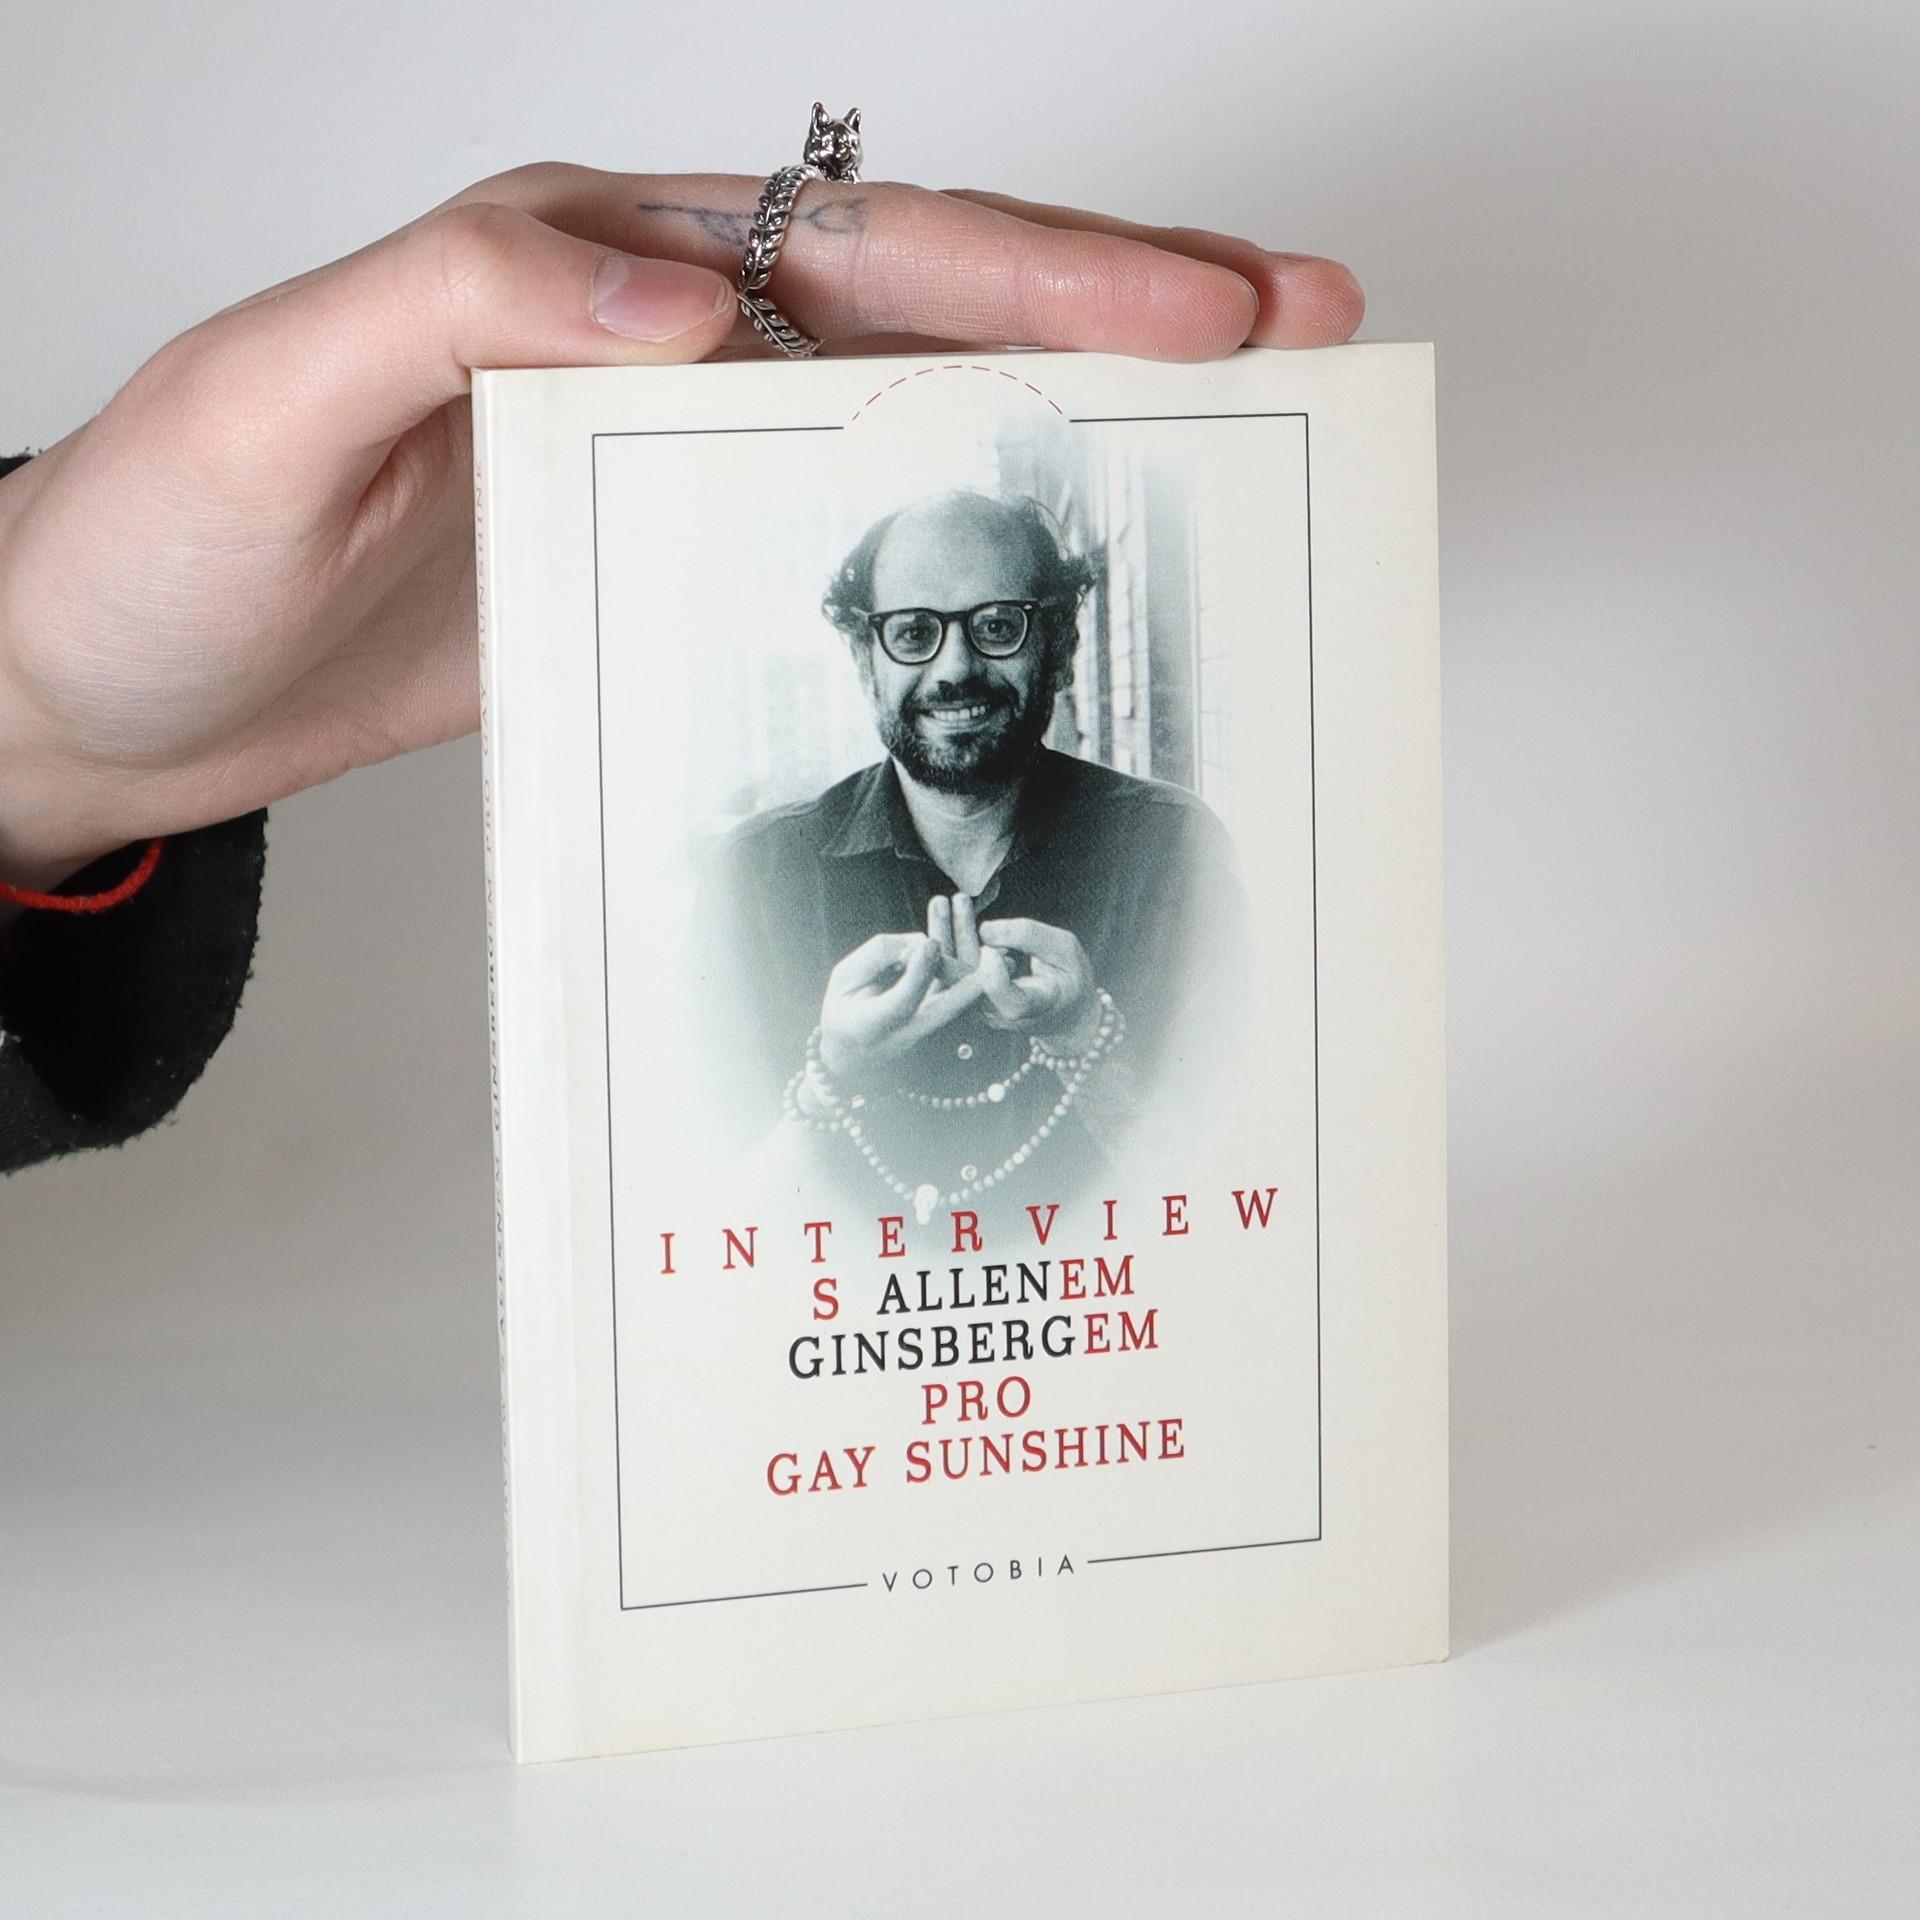 antikvární kniha Interview s Allenem Ginsbergem pro Gay Sunshine, 1996